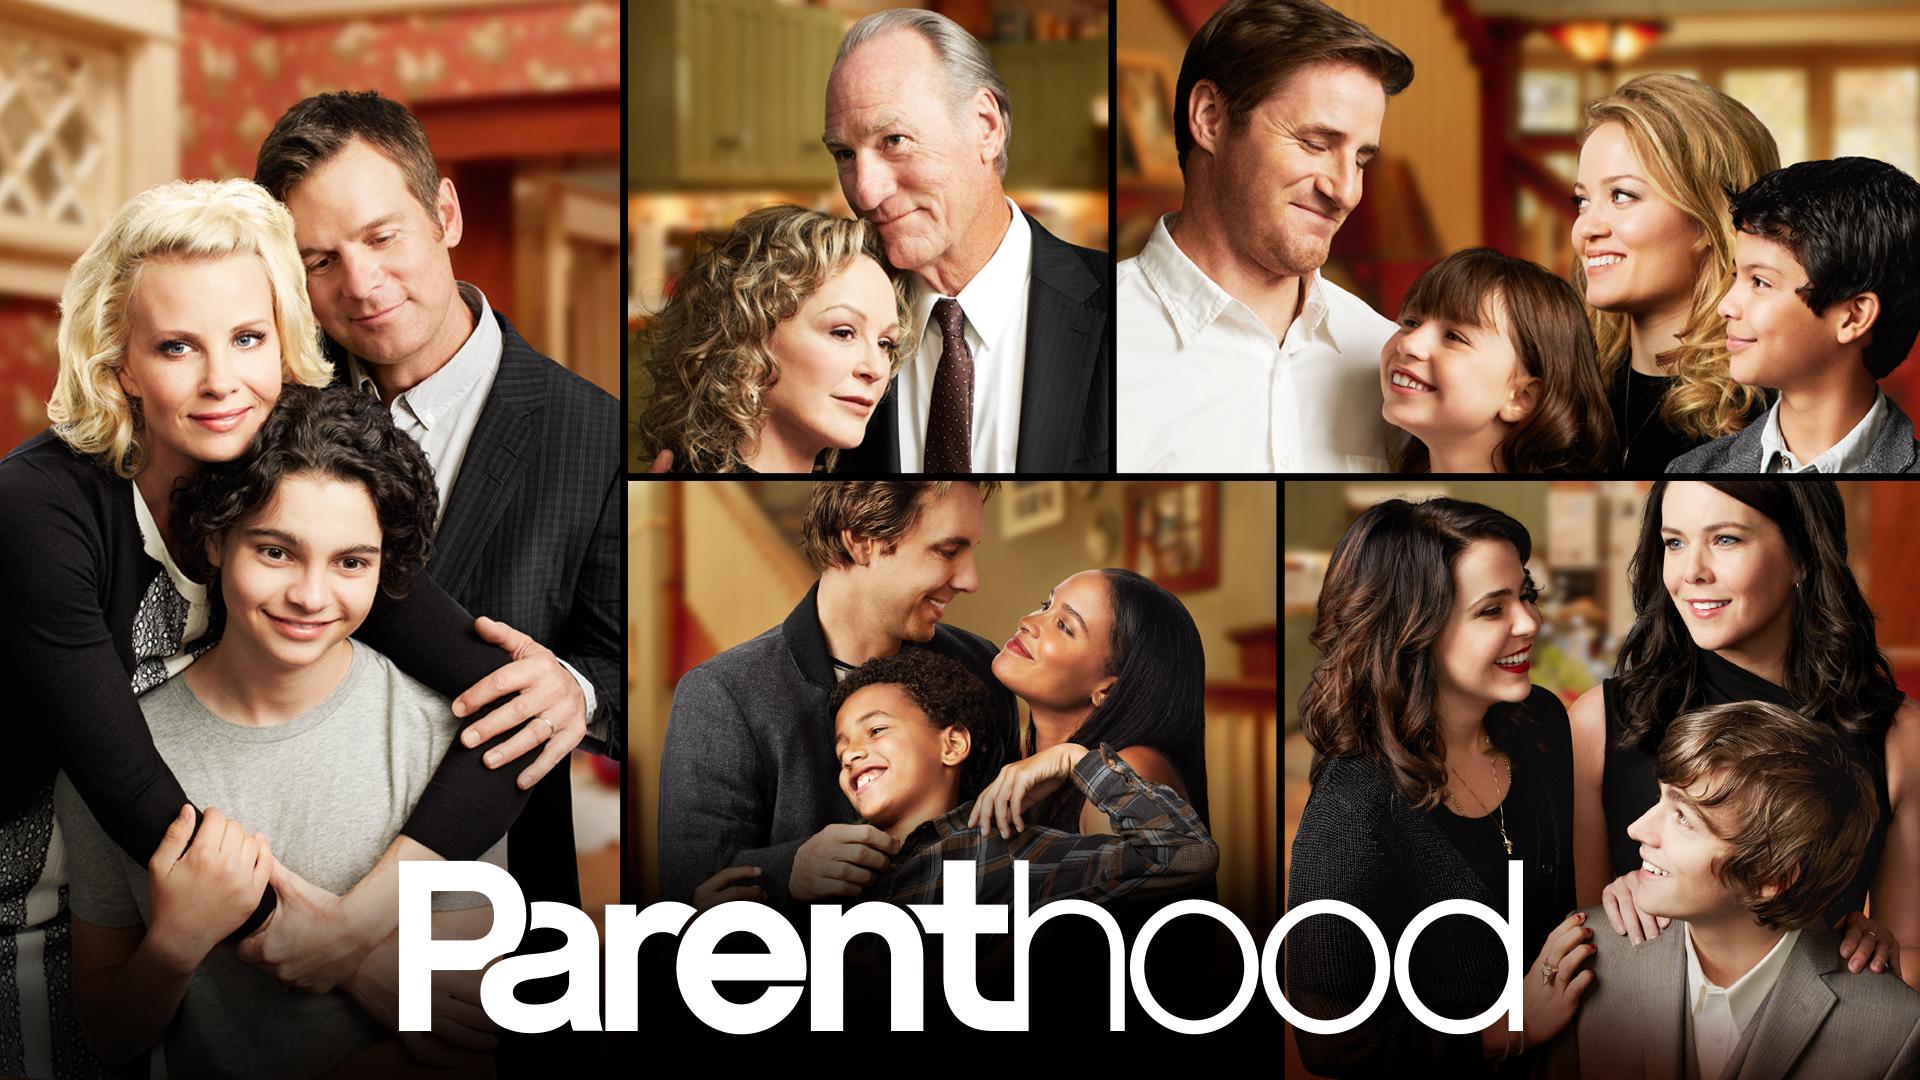 Parenthood actors dating